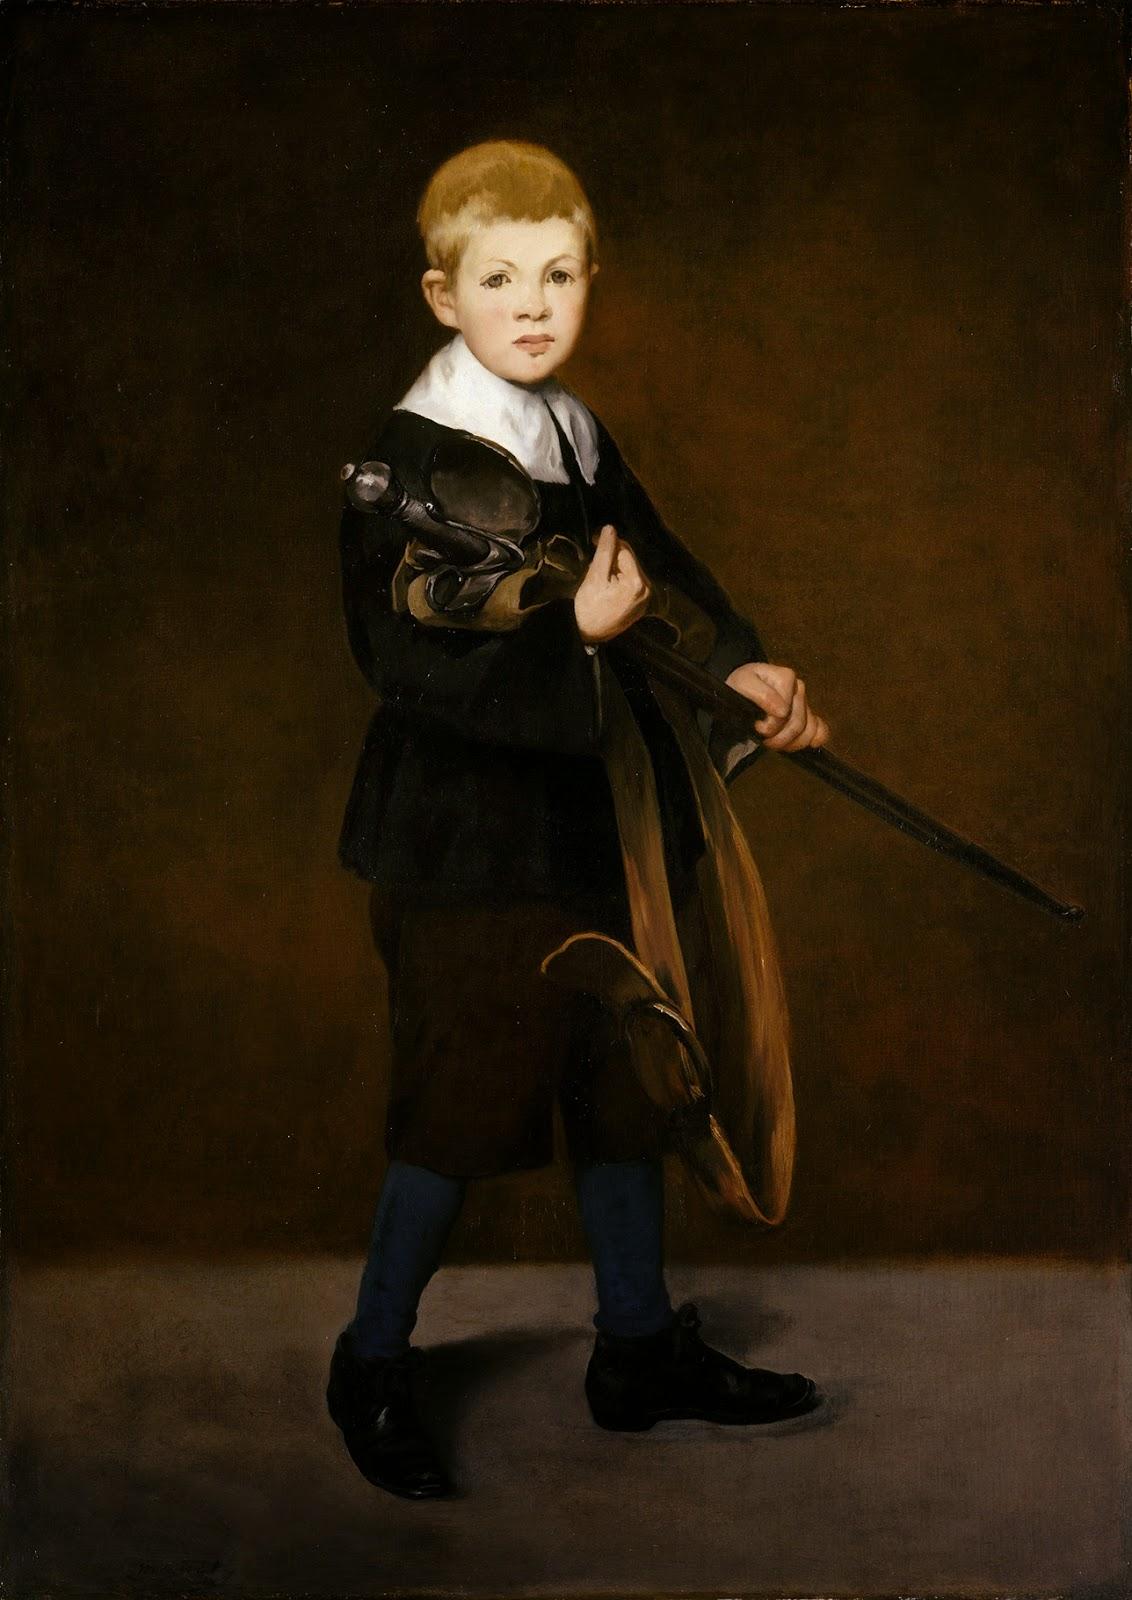 Édouard Manet, Niño con espada (1861), Metropolitan Museum, Nueva York